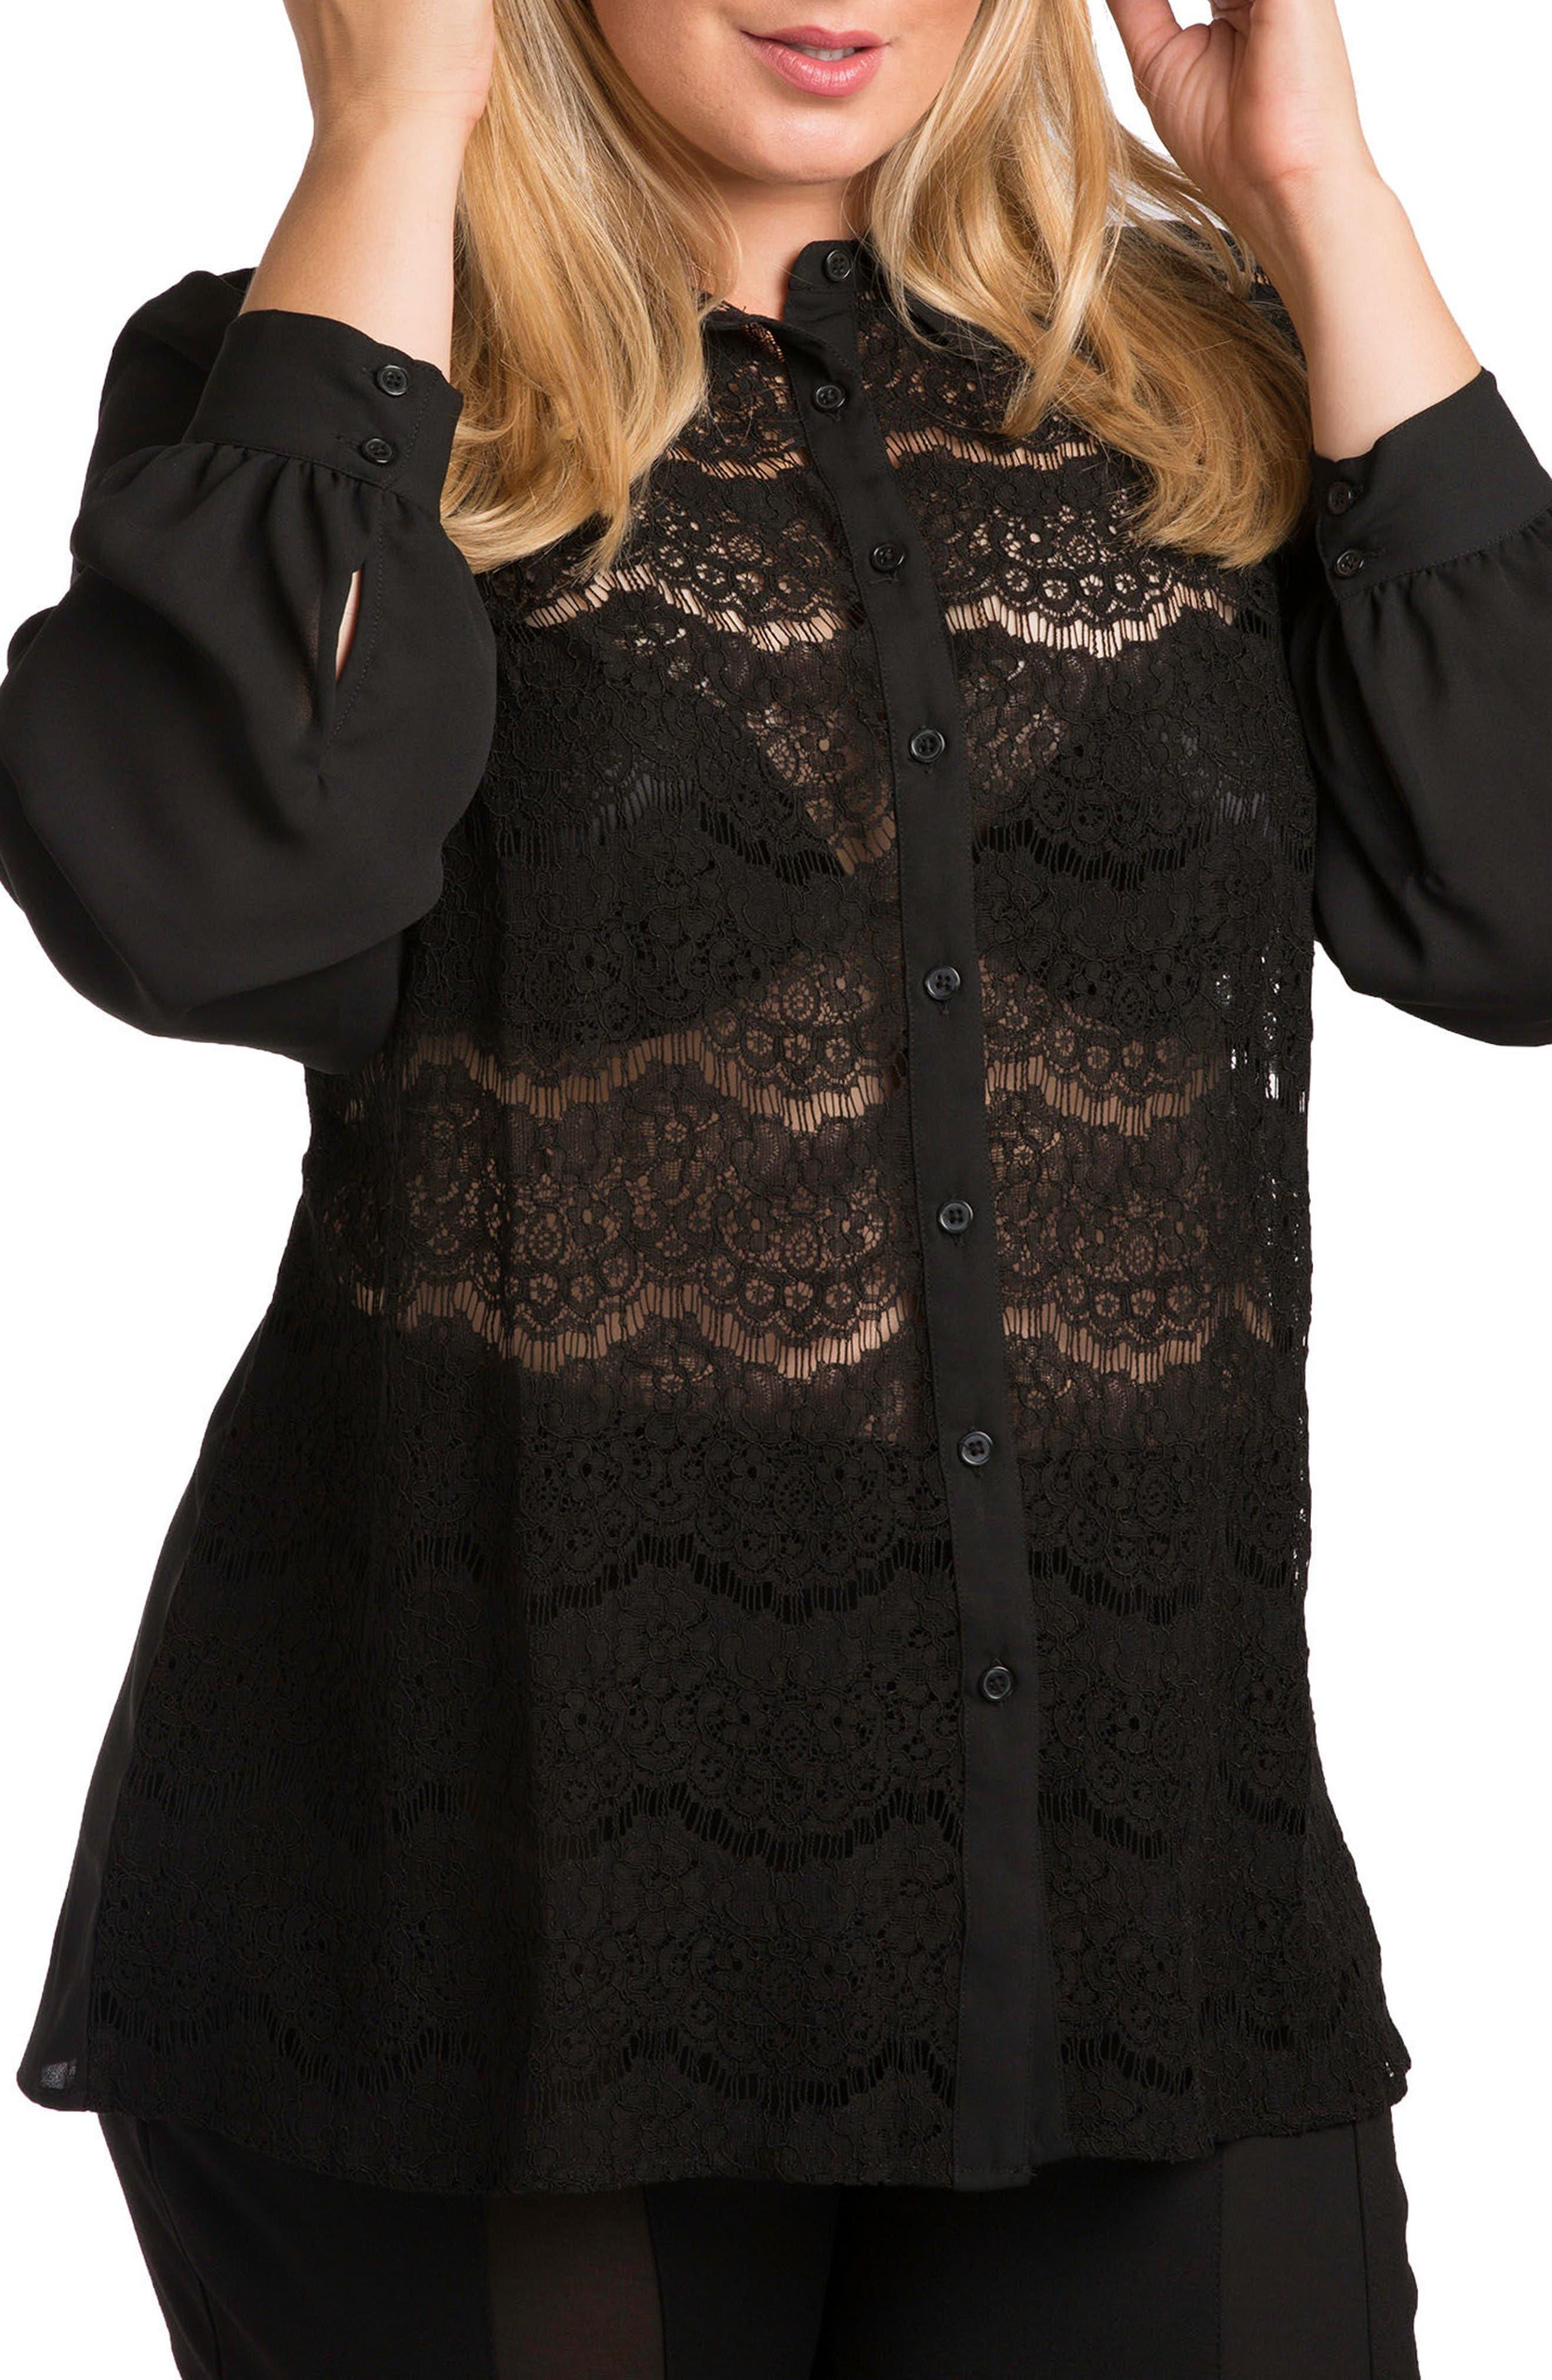 Coco Lace Front Shirt,                         Main,                         color, Black